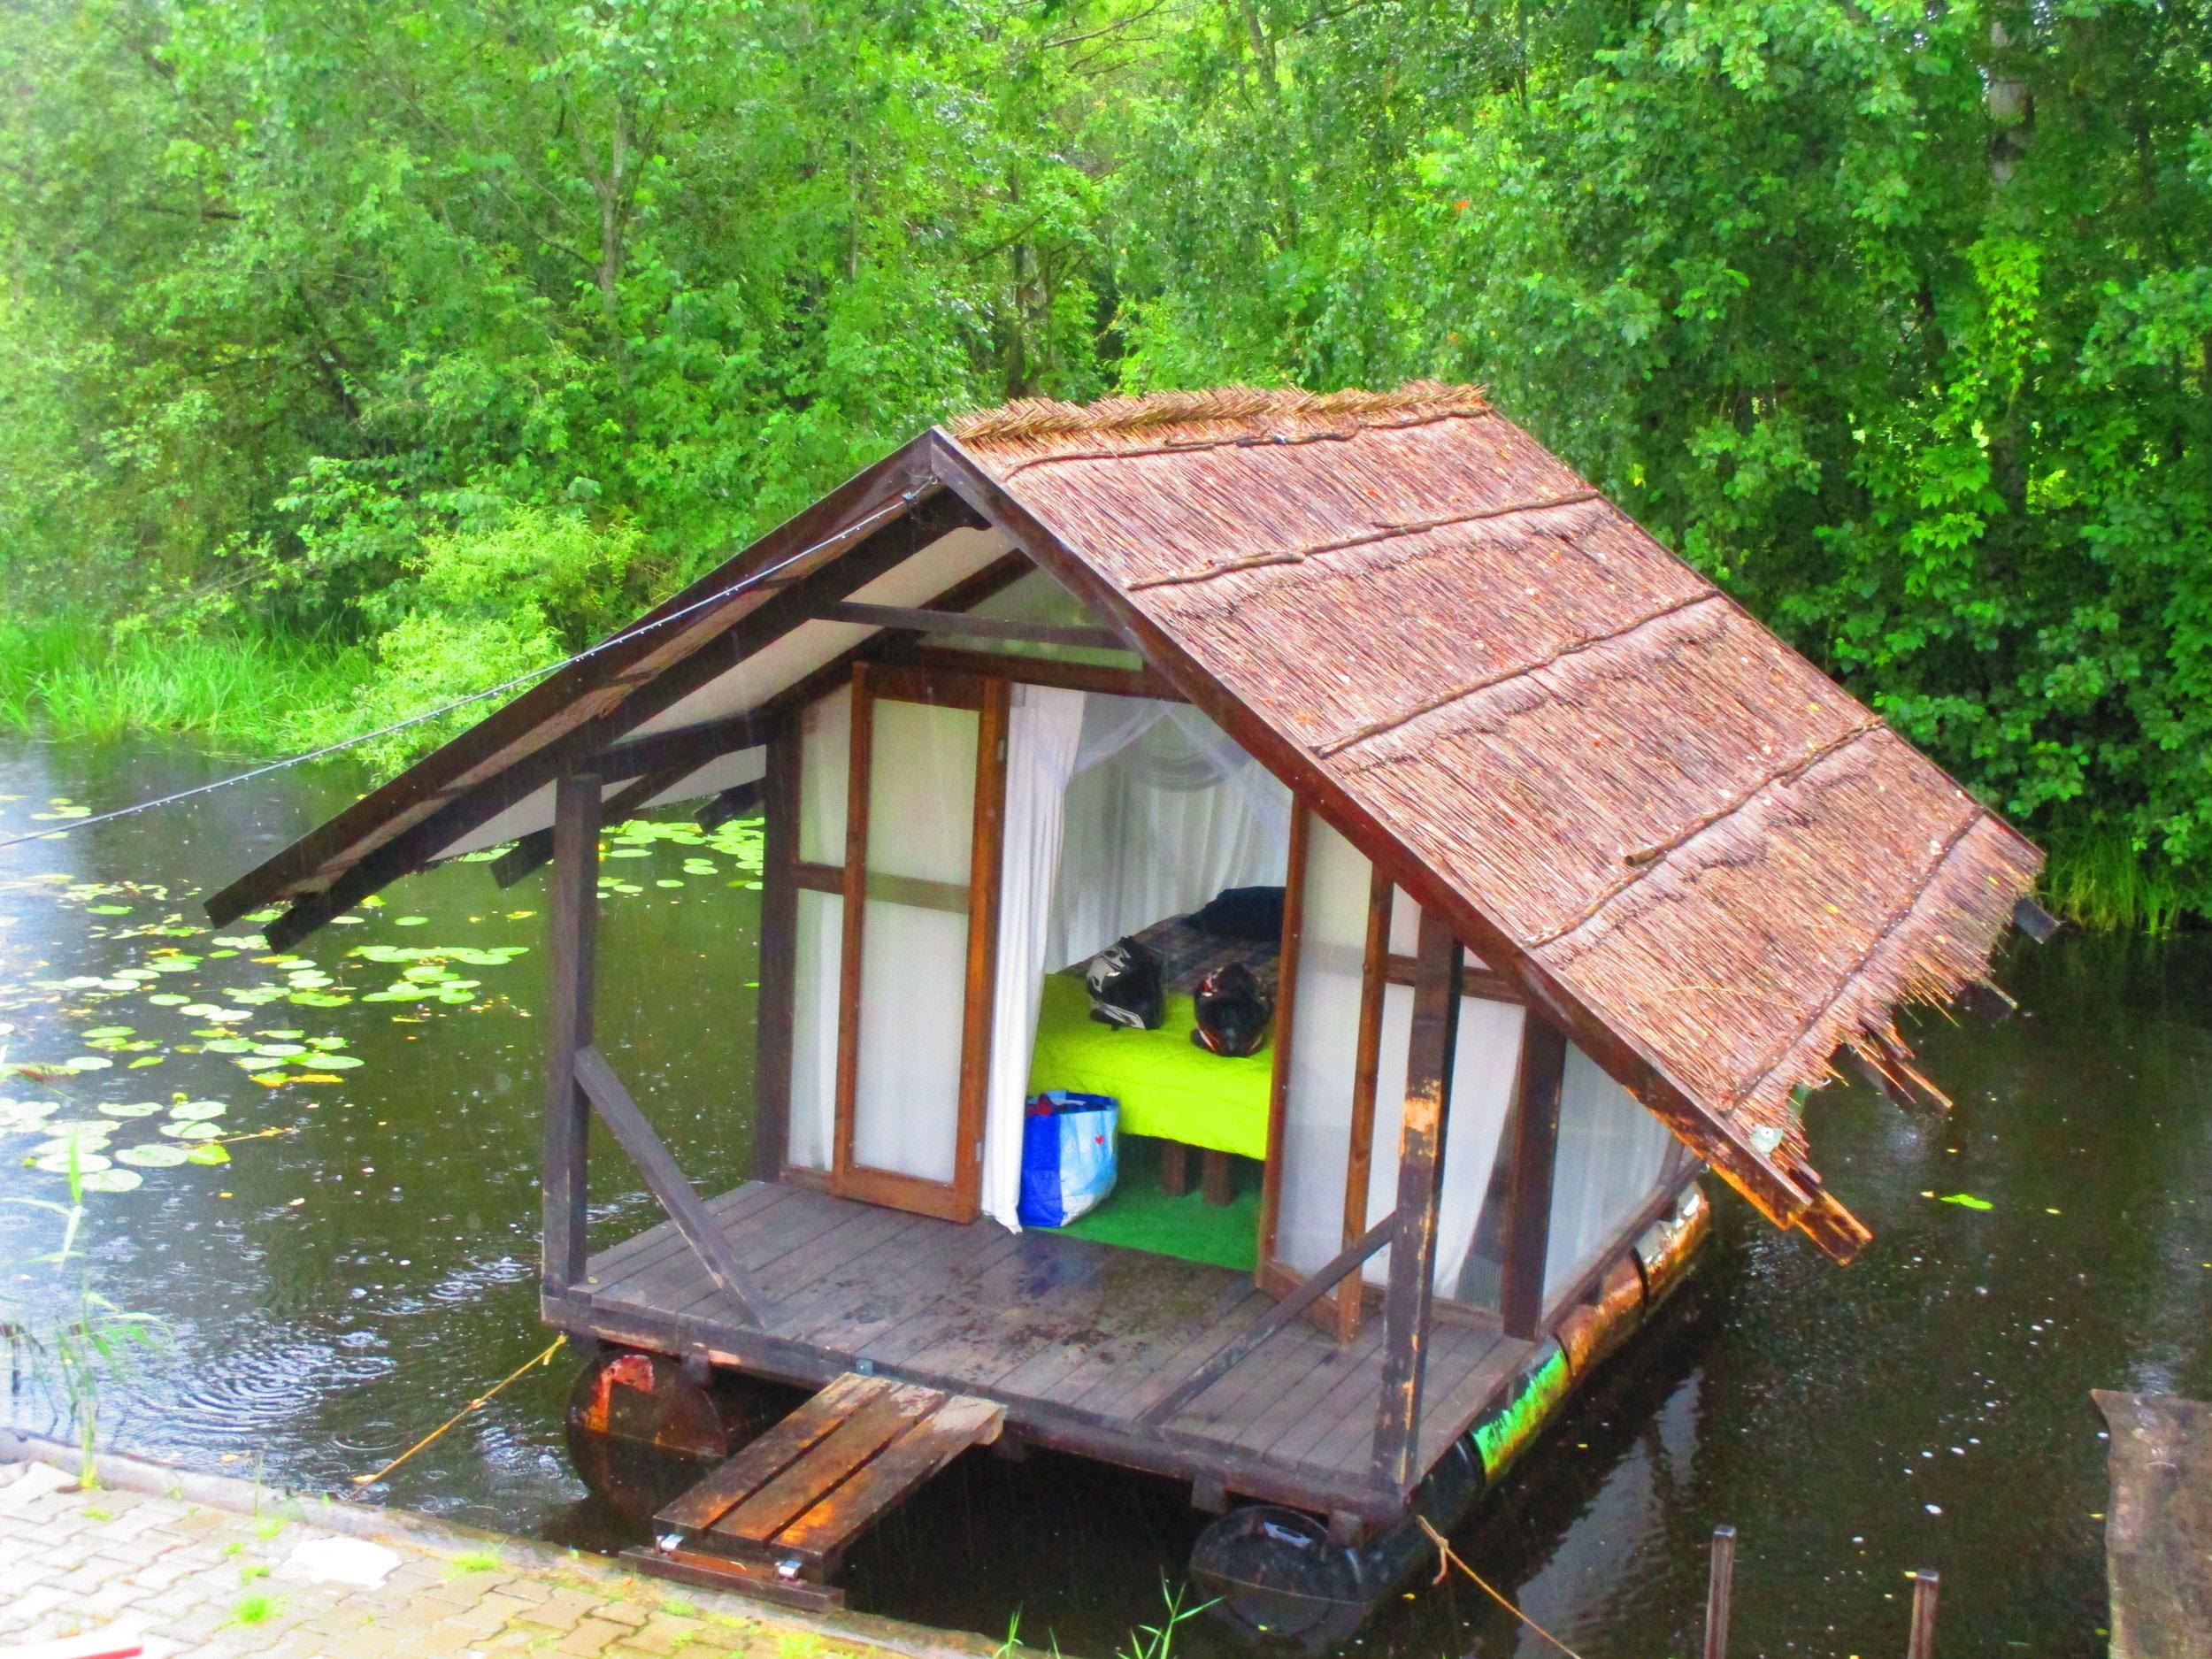 Mosquito camp, Riga, Latvia